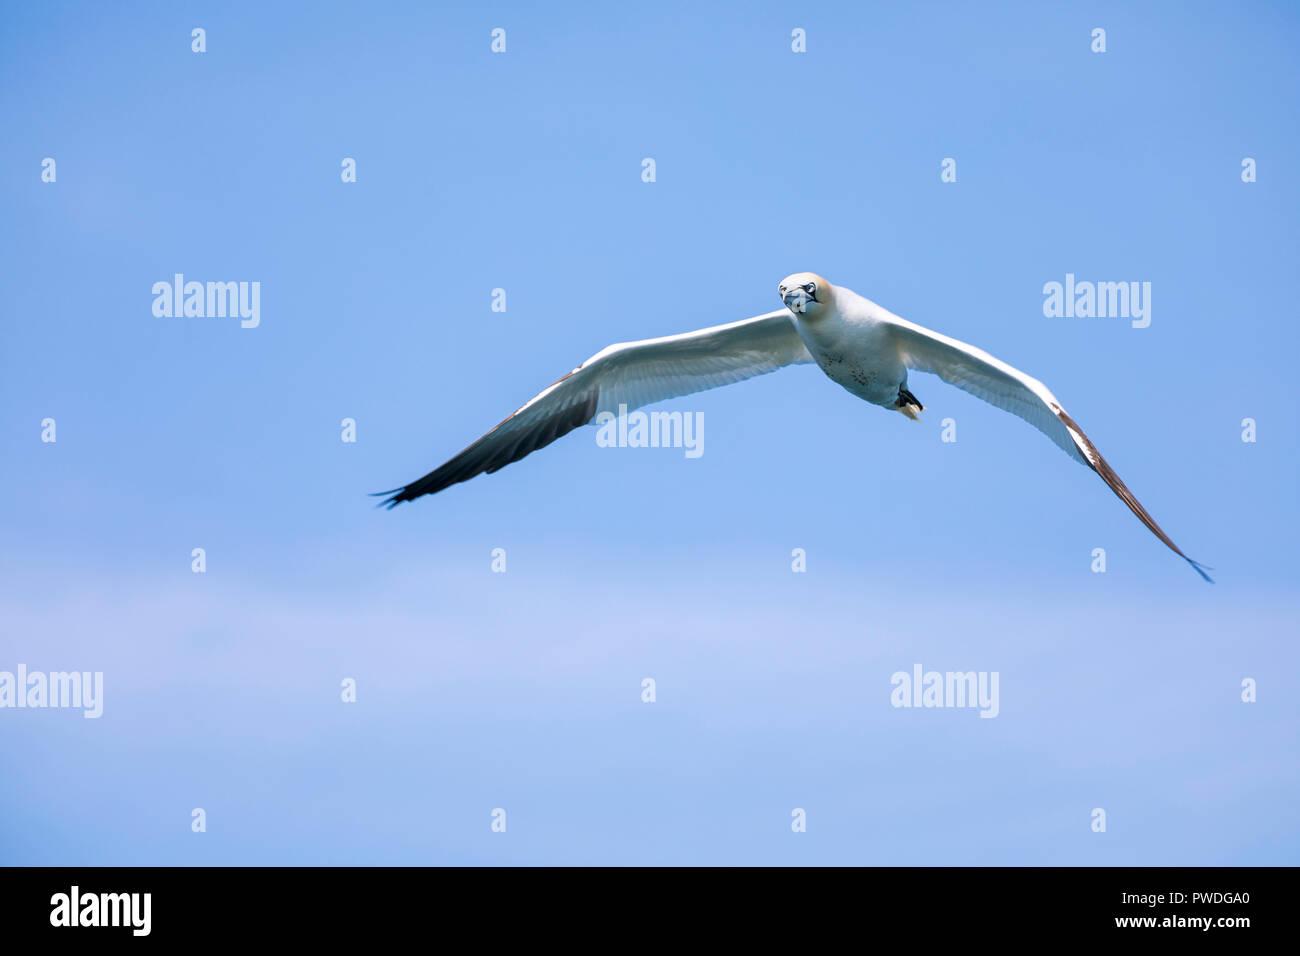 Northern Gannet (Morus bassanus) - Stock Image